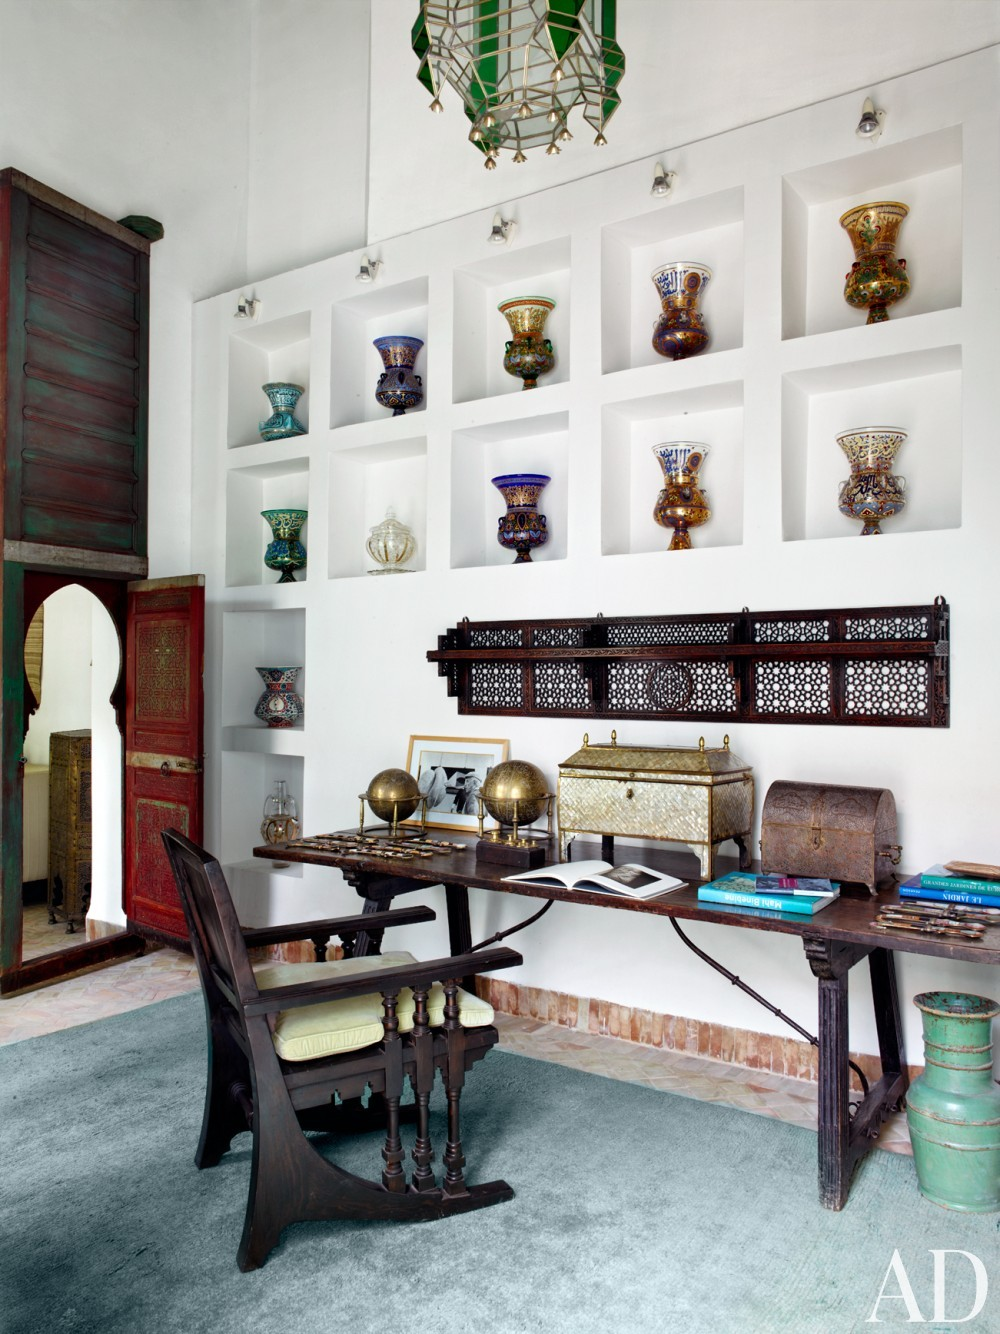 Exotic Bedroom by Ahmad Sardar-Afkhami in Marrakech, Morocco